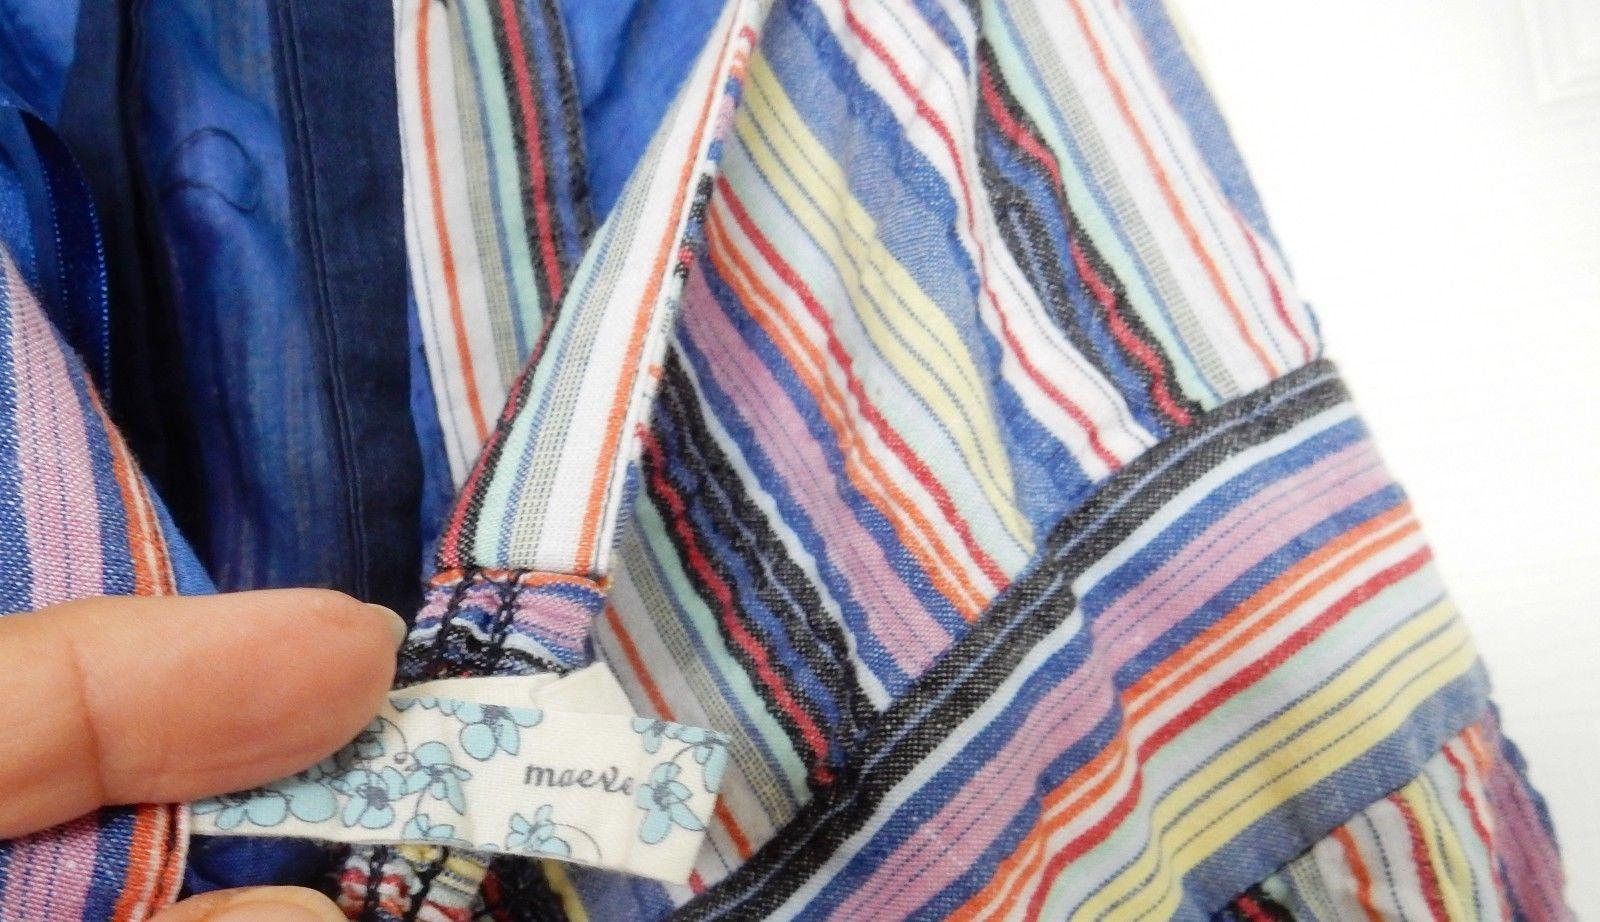 Anthroplologie Maeve Dress Prairie Long Sun Halter Cotton Multi Stripe S/M